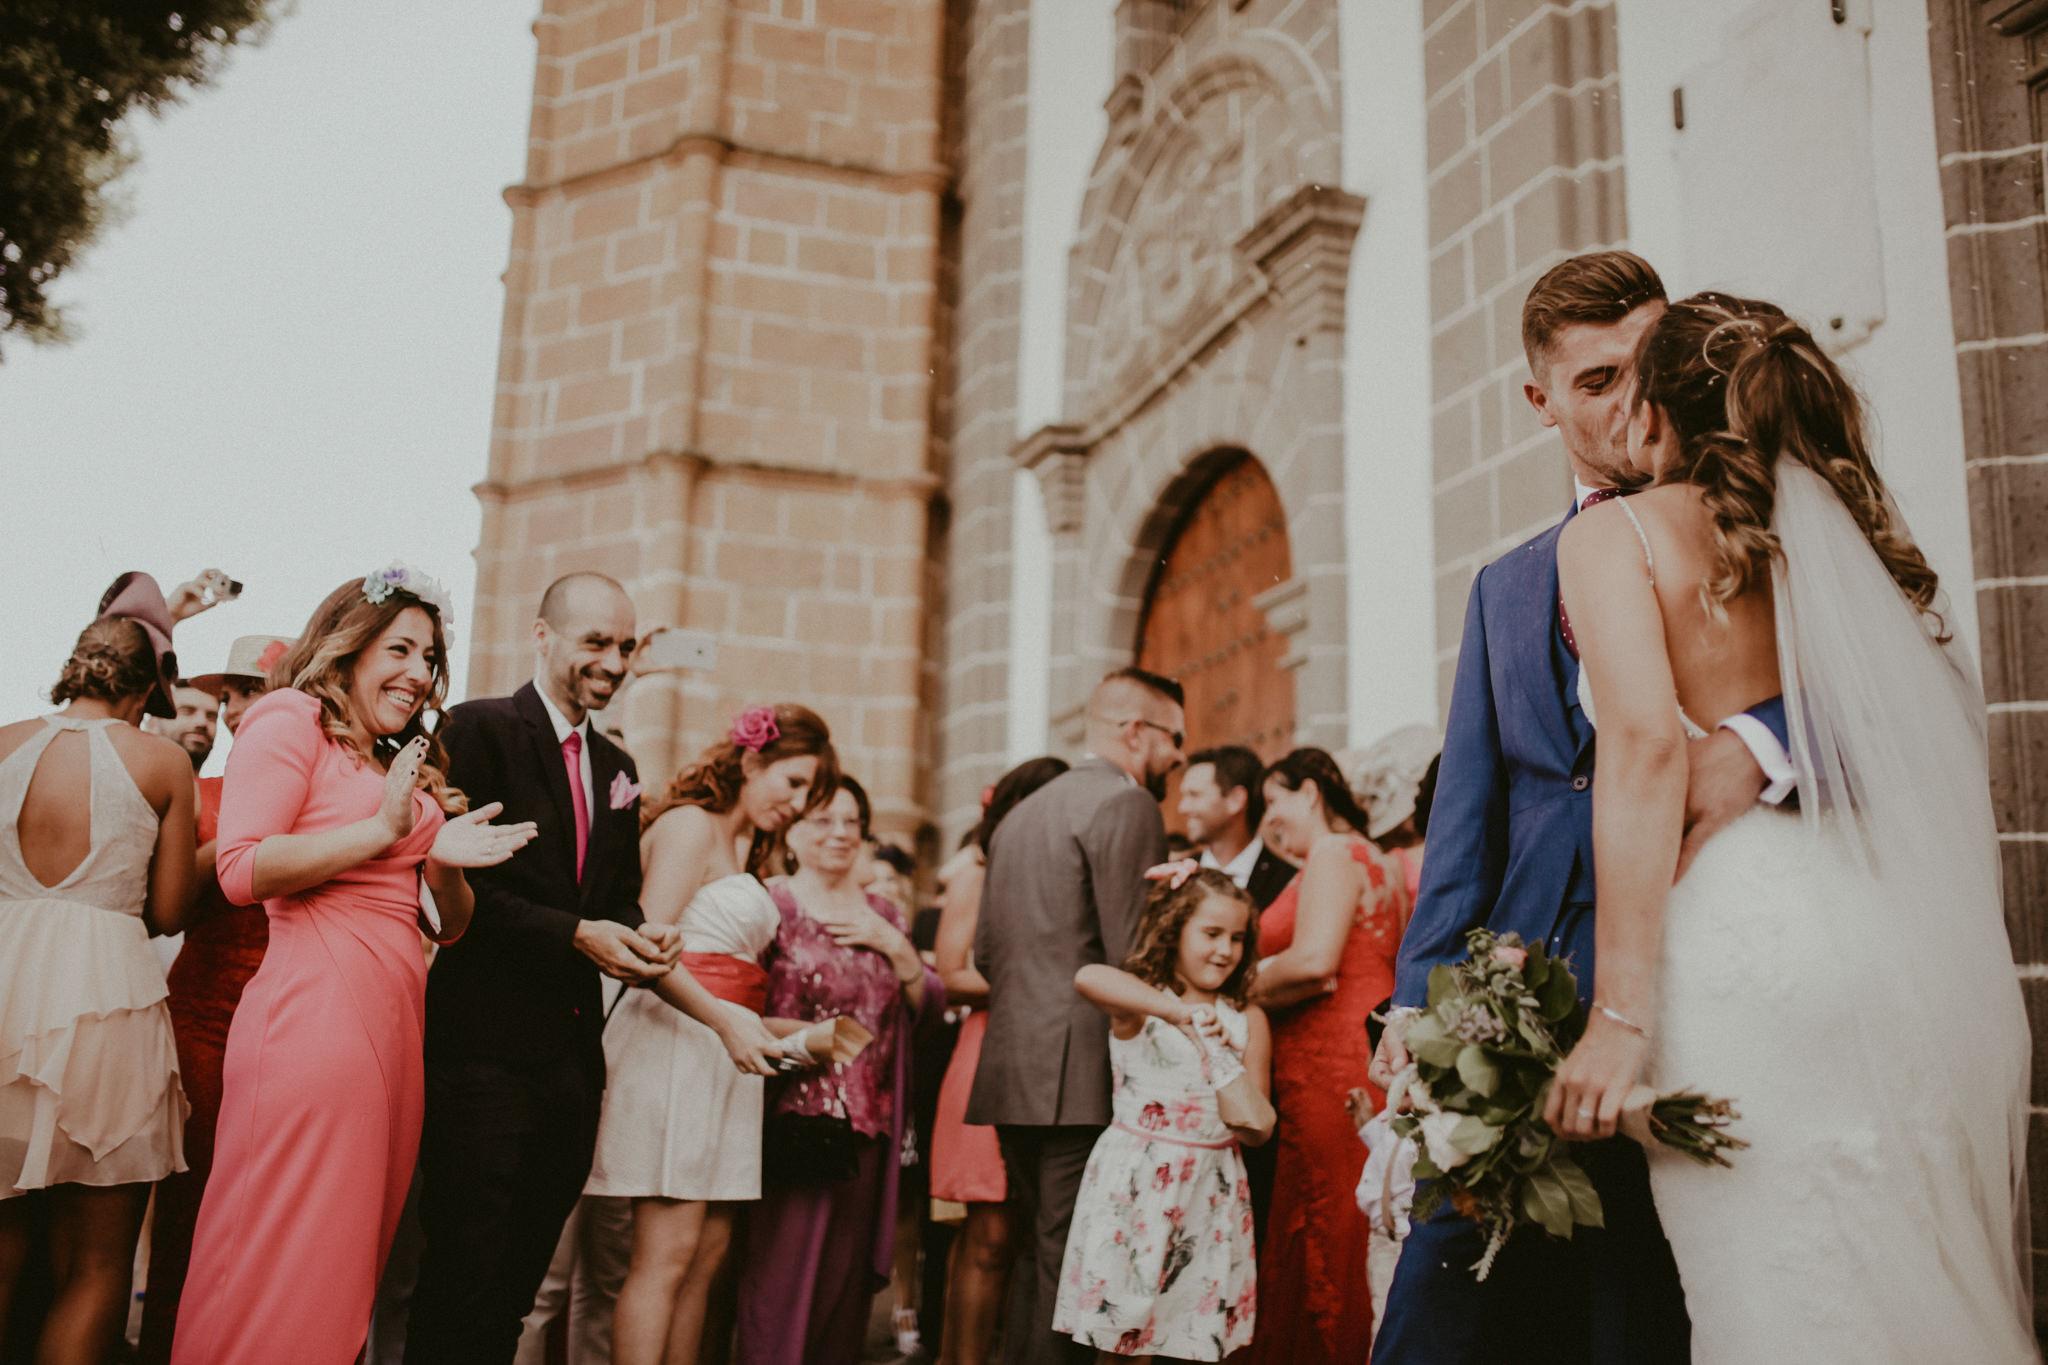 boda-diferente-fotografo-boda-laspalmas-grancanaria-47